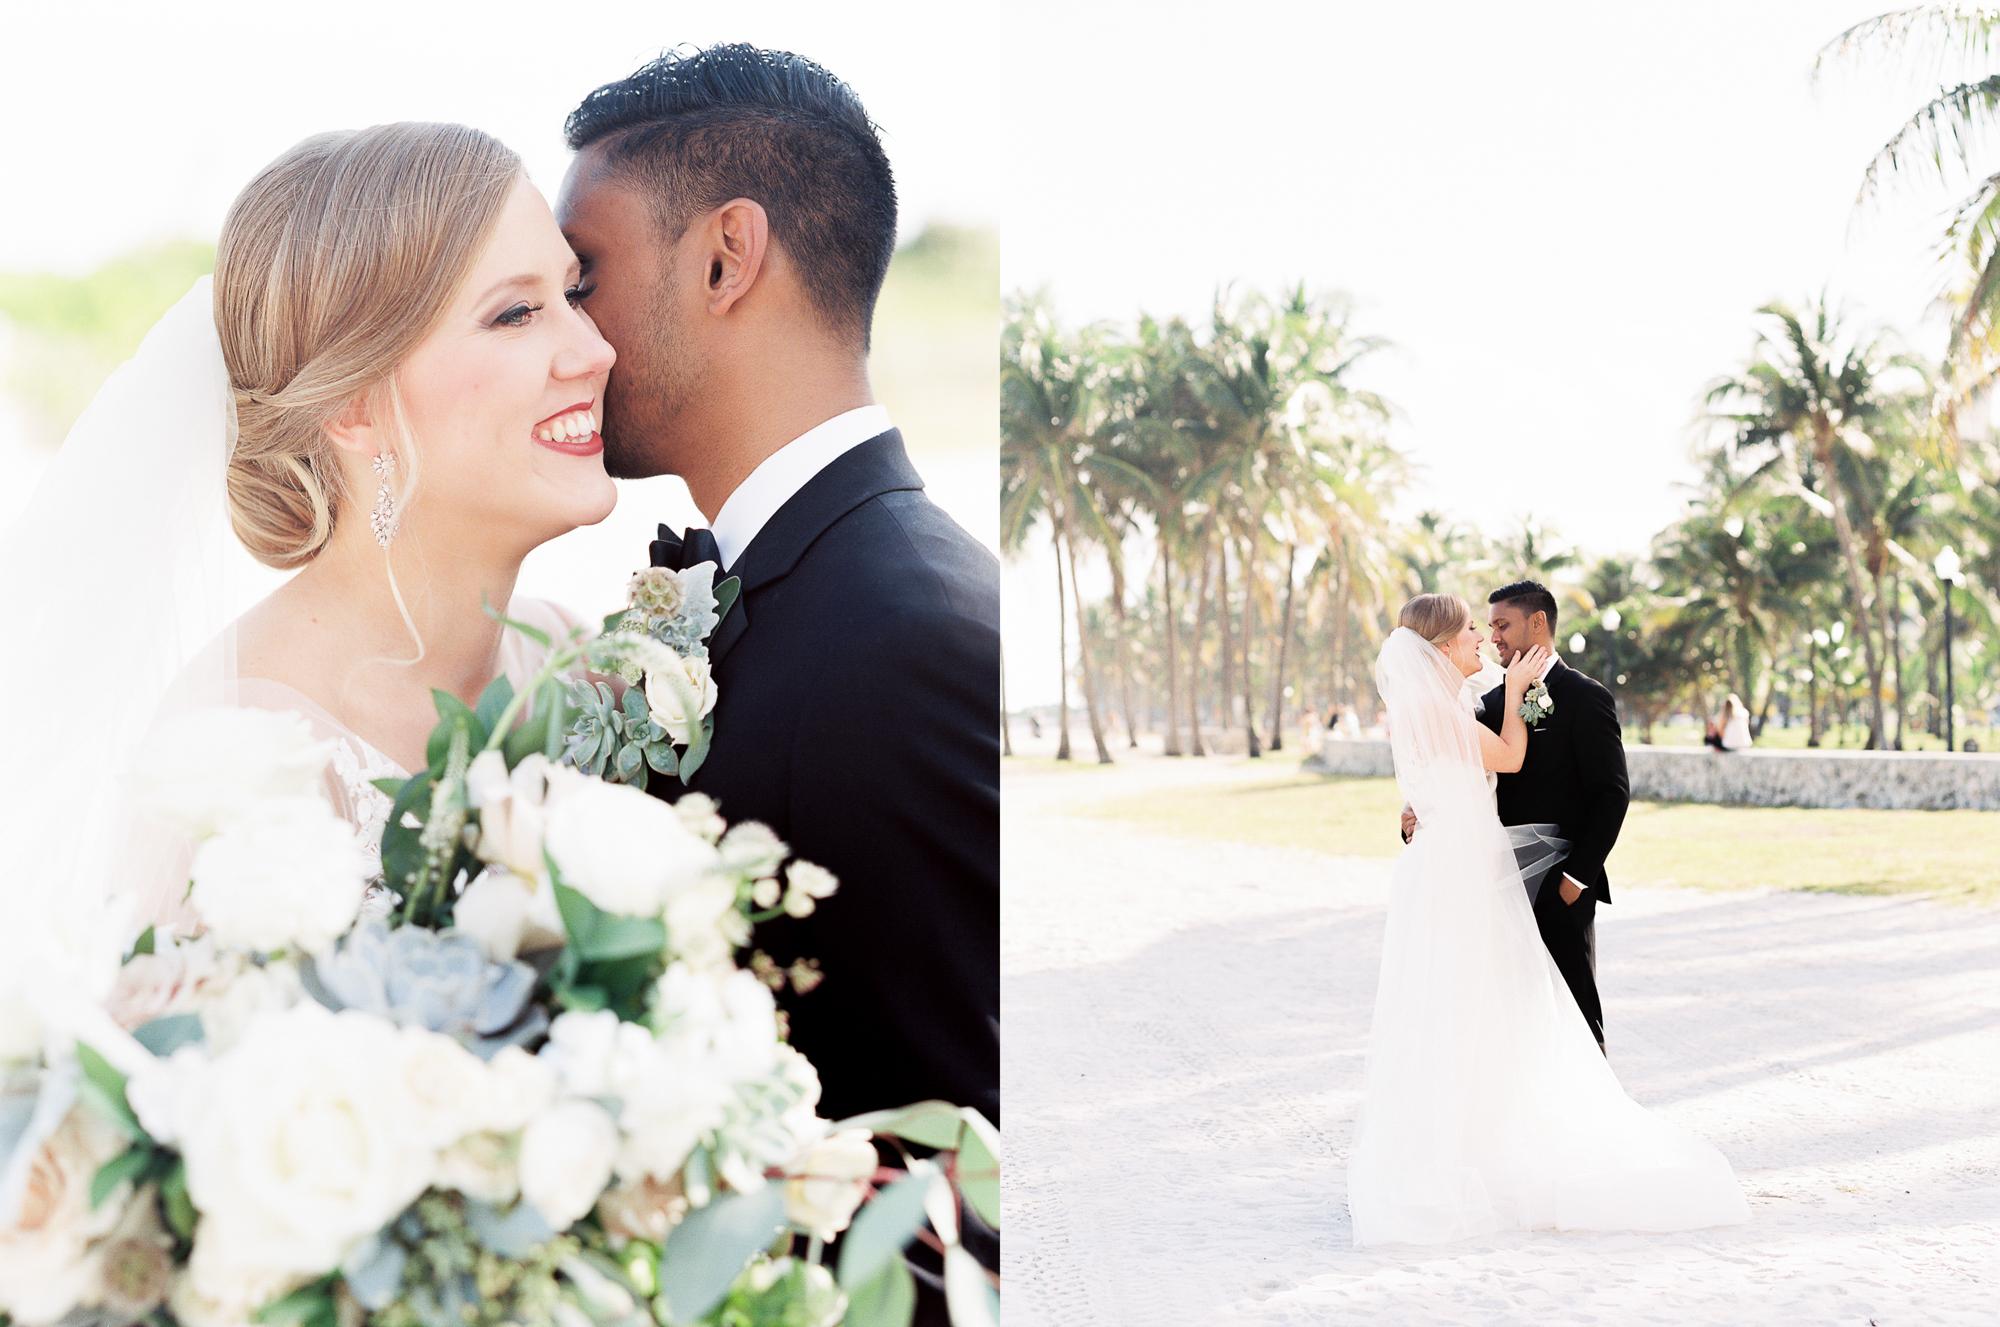 betsy-hotel-wedding-south-beach-miami-charleston-south-carolina-destination-wedding-photographer-13.jpg